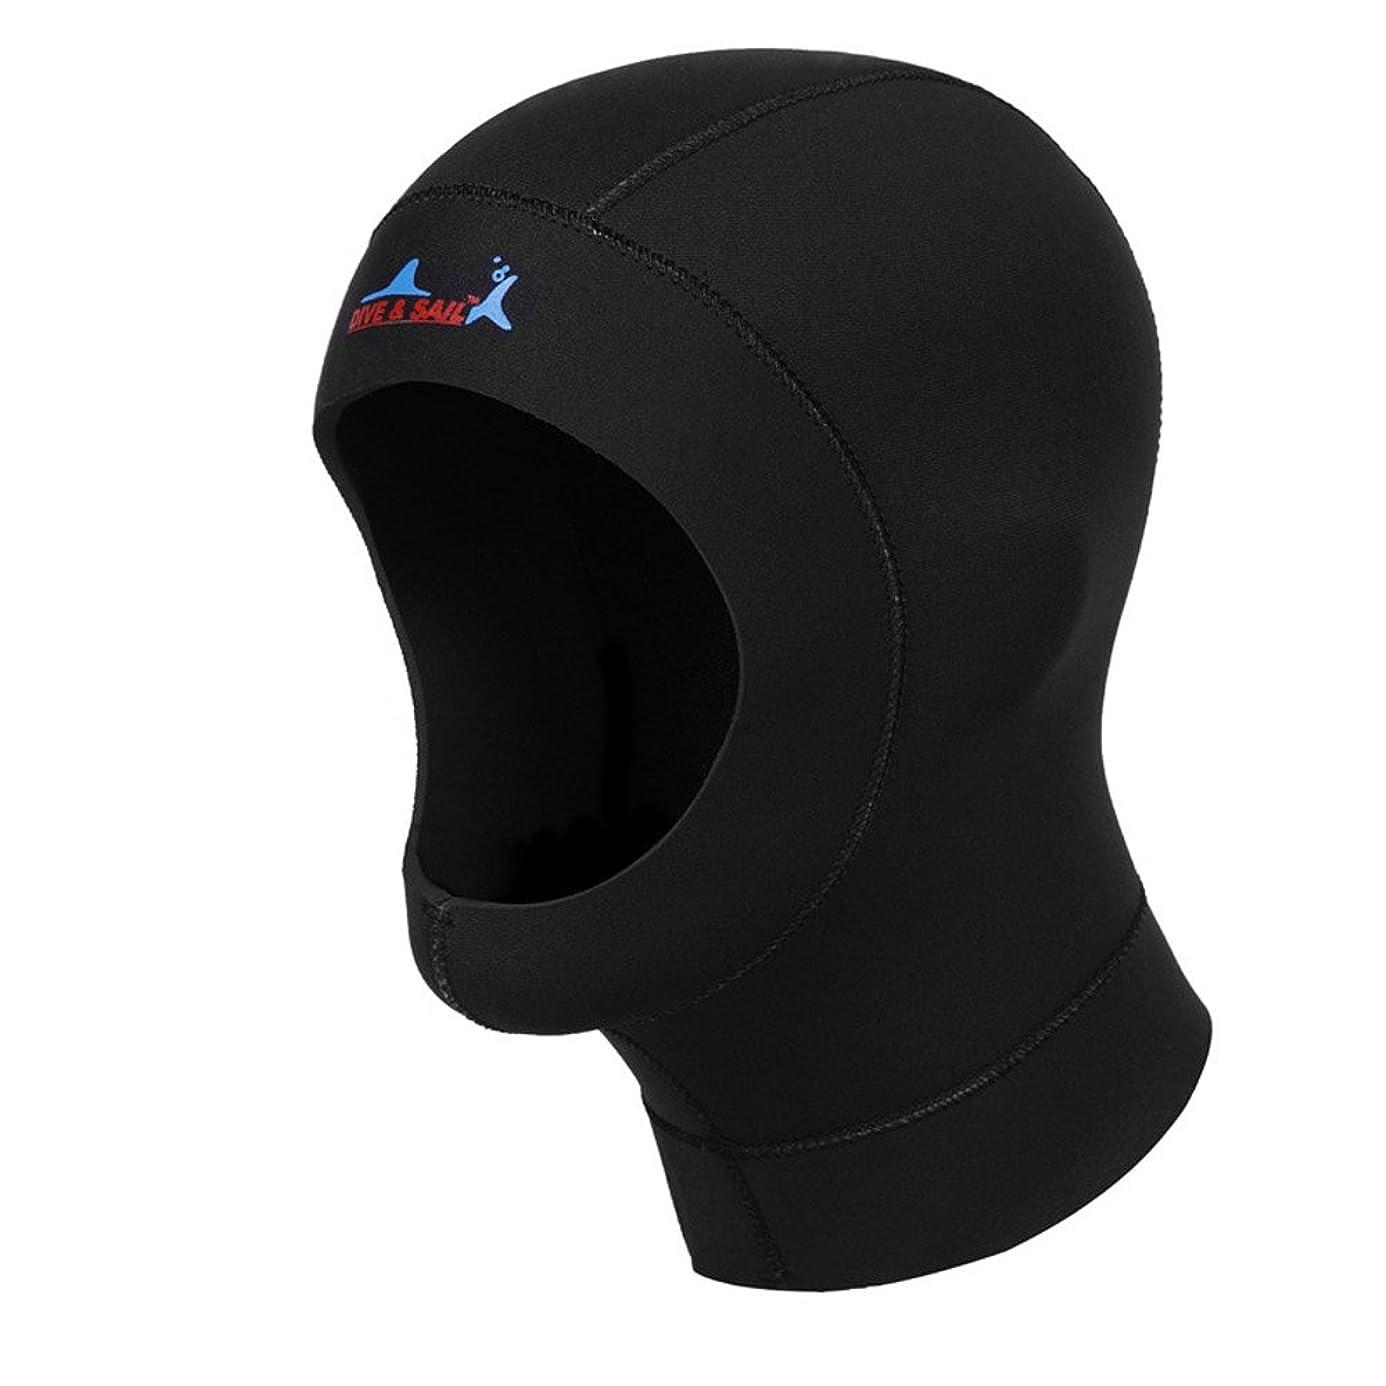 A Point Wetsuits Premium Neoprene 1mm Sport Cap Hot Skins Hood